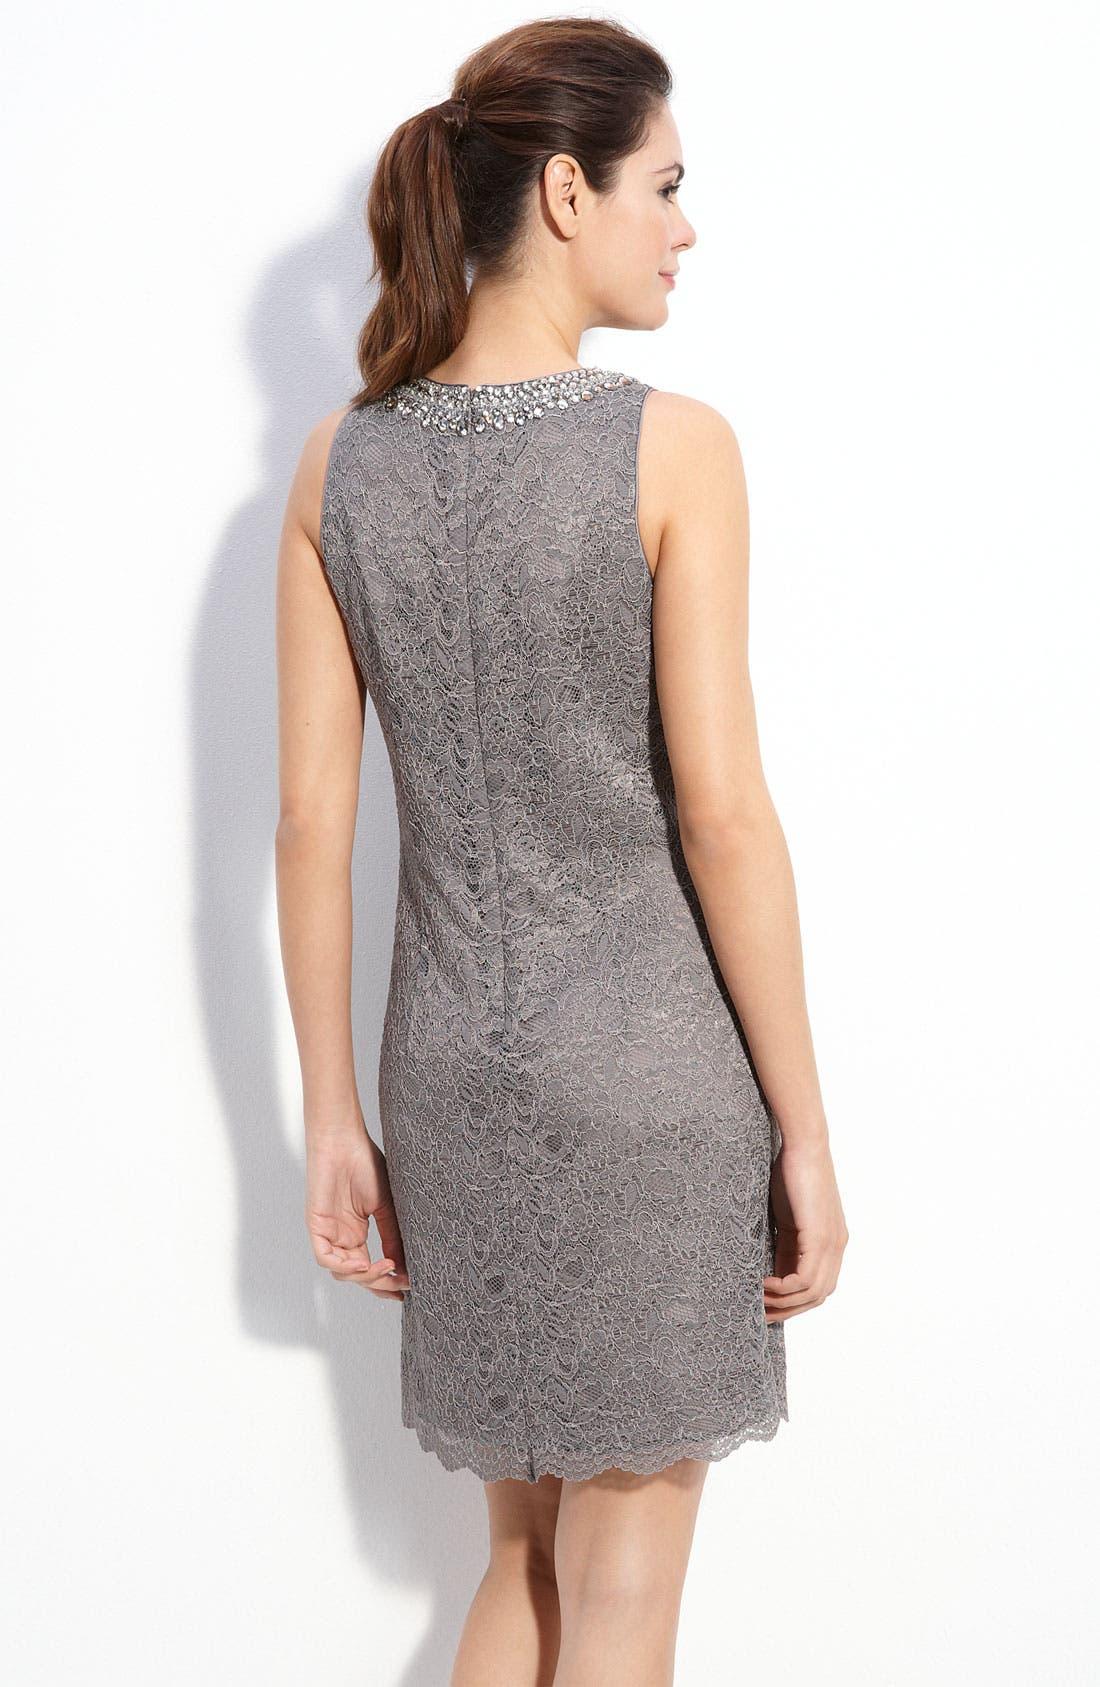 MAGGY LONDON, Beaded Lace Shift Dress, Alternate thumbnail 2, color, 020